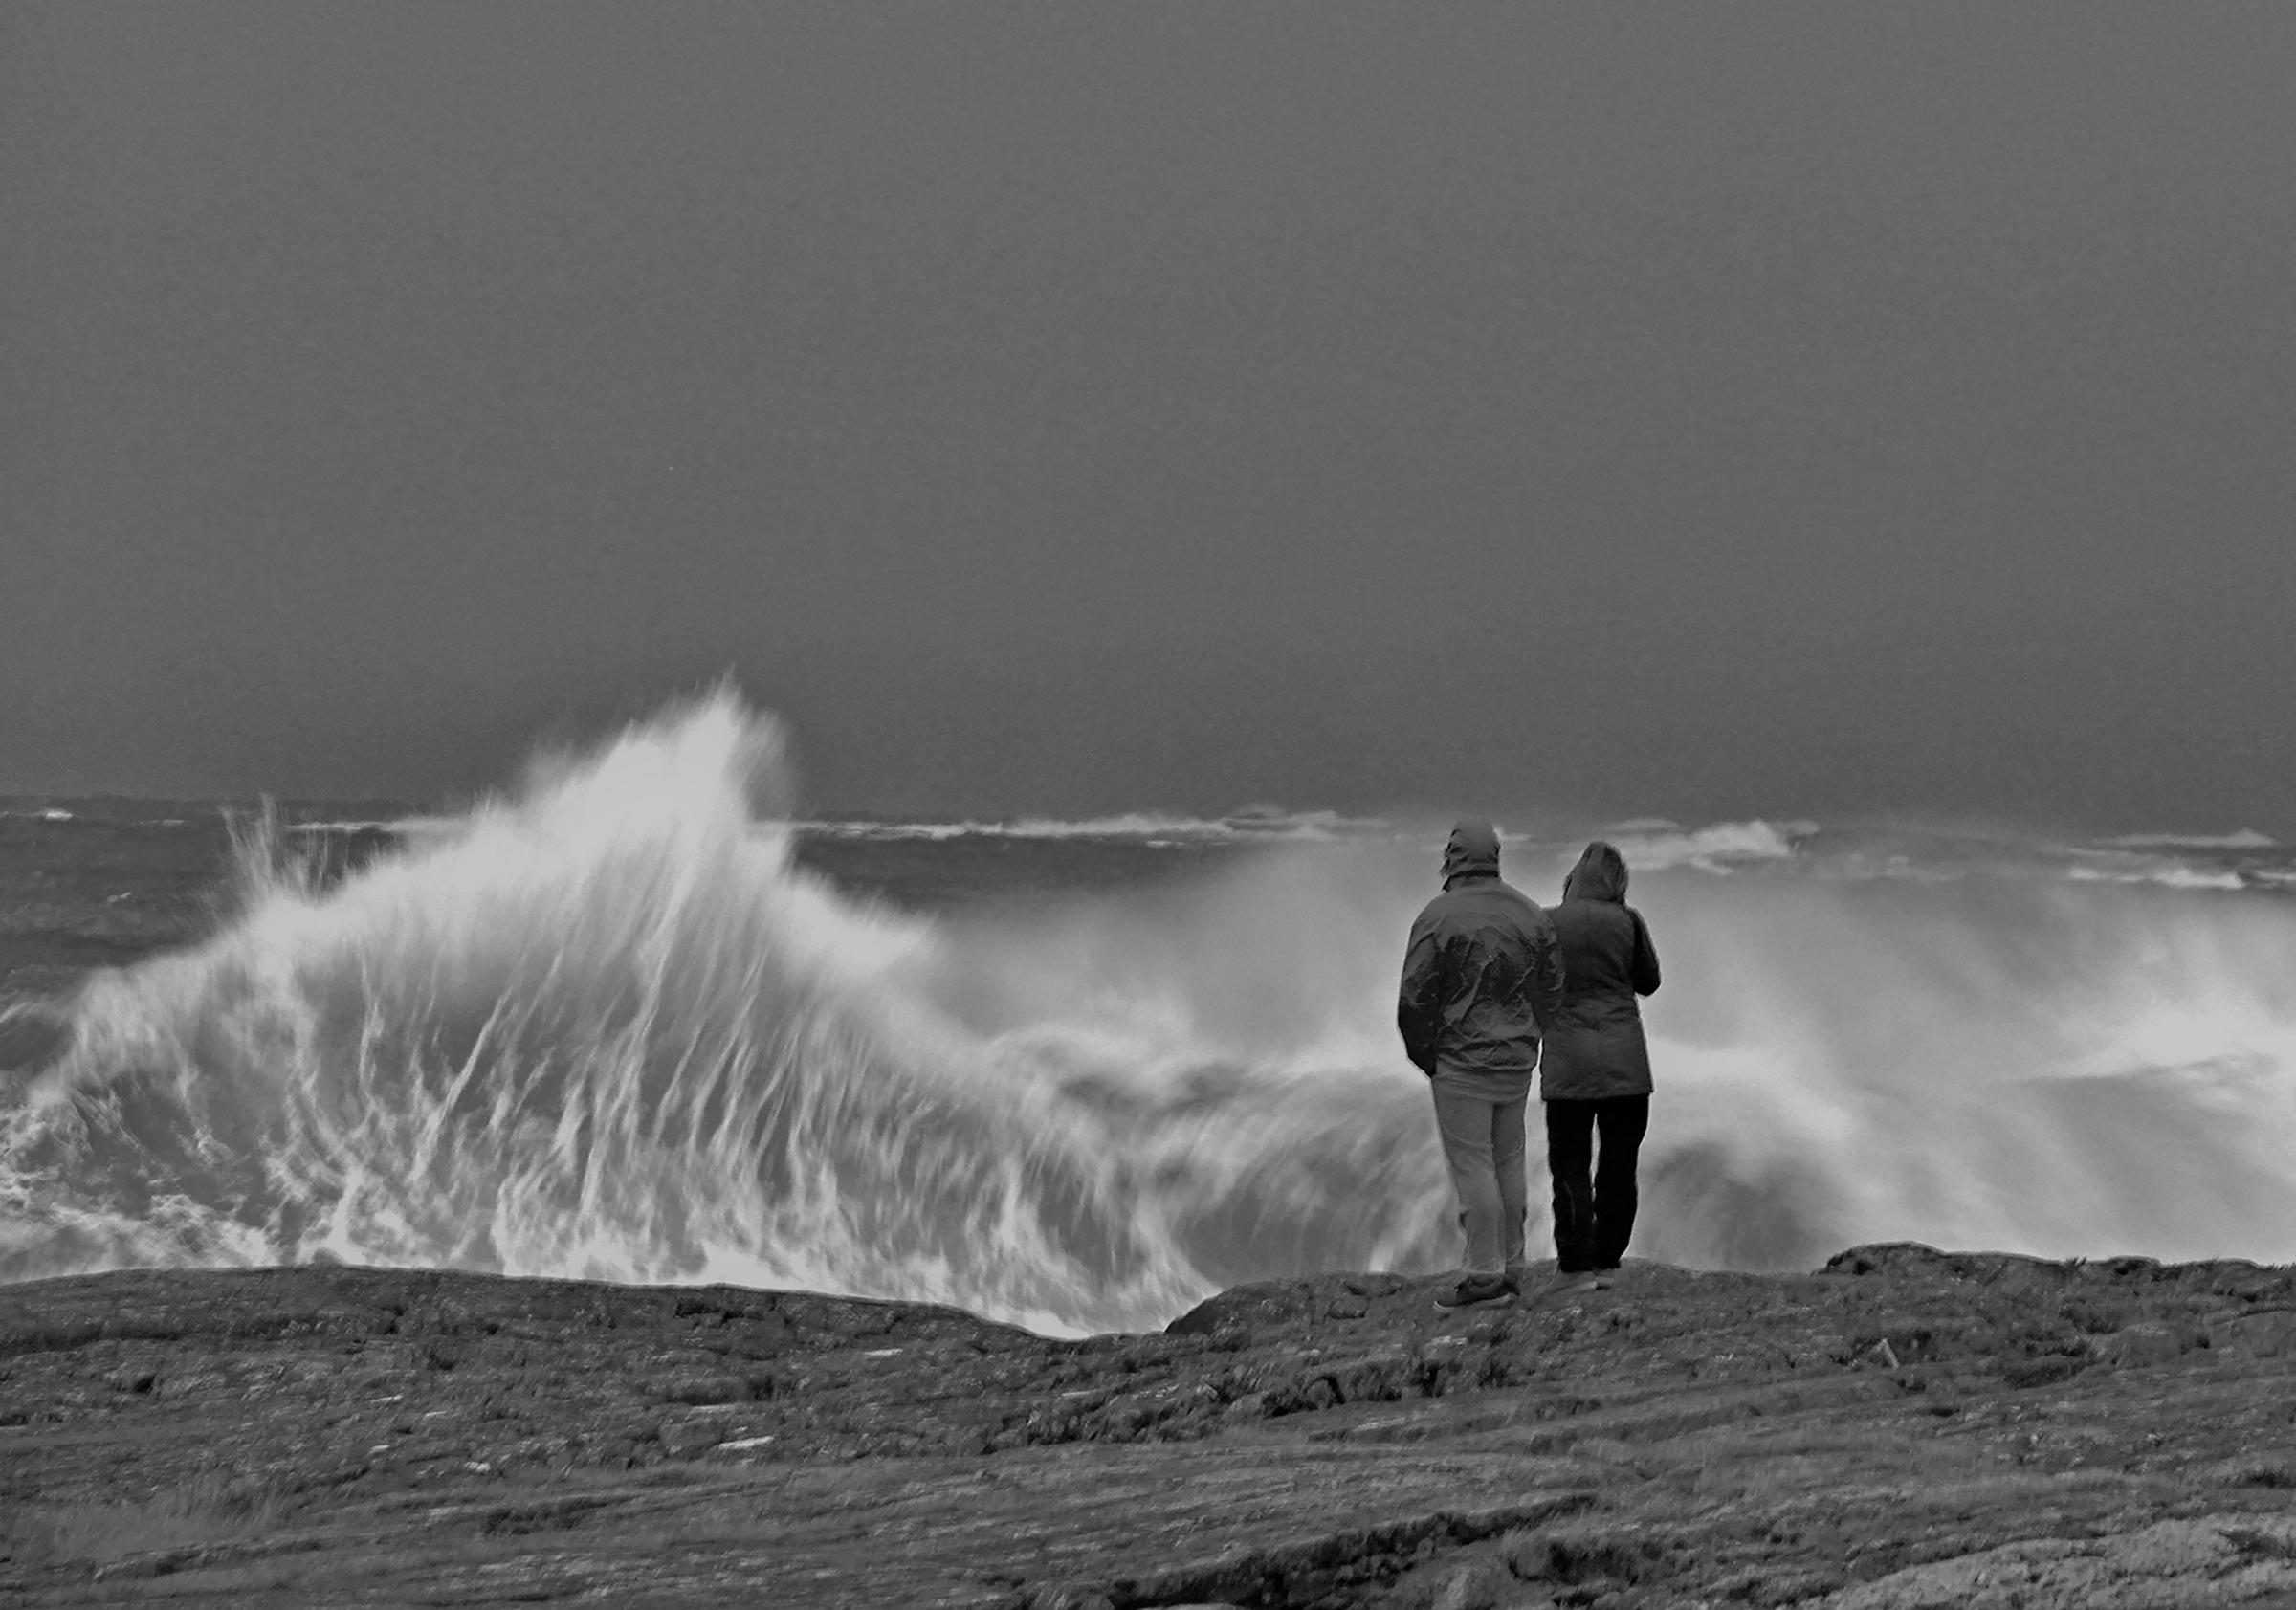 05-07 - Atlanter havs bølger.JPG